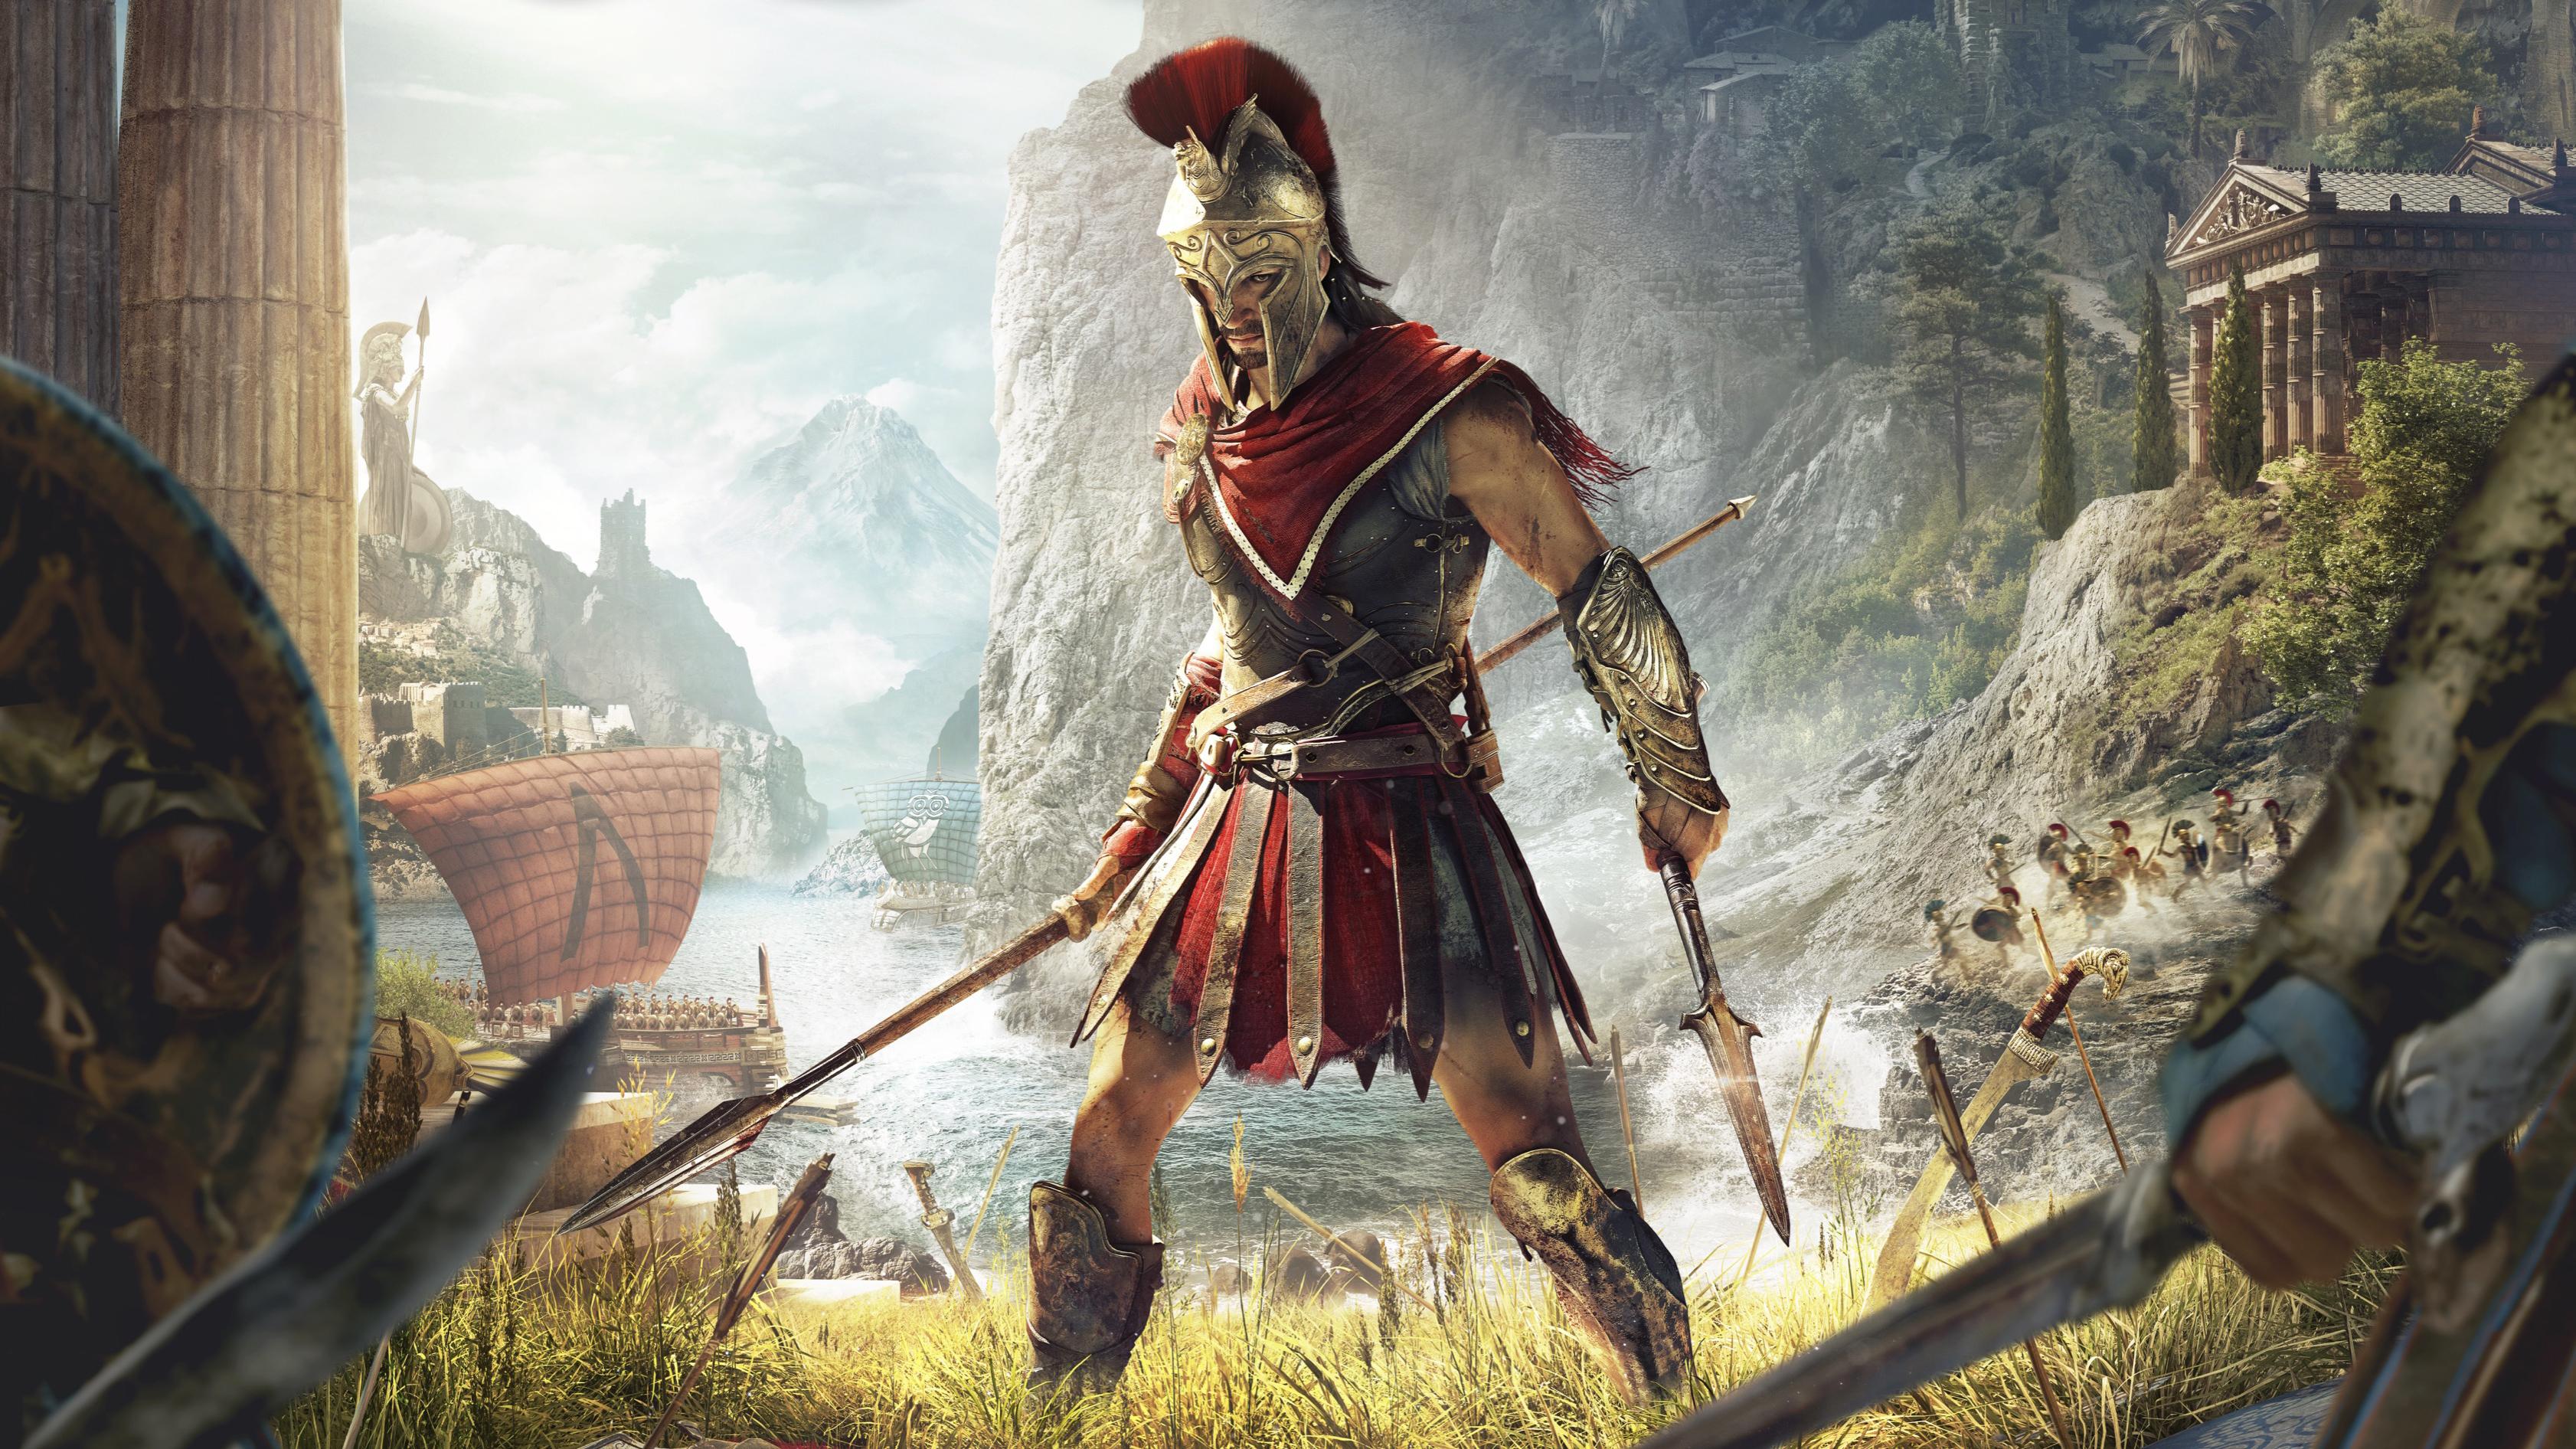 Assassins Creed 3 Wallpaper Hd 1080p